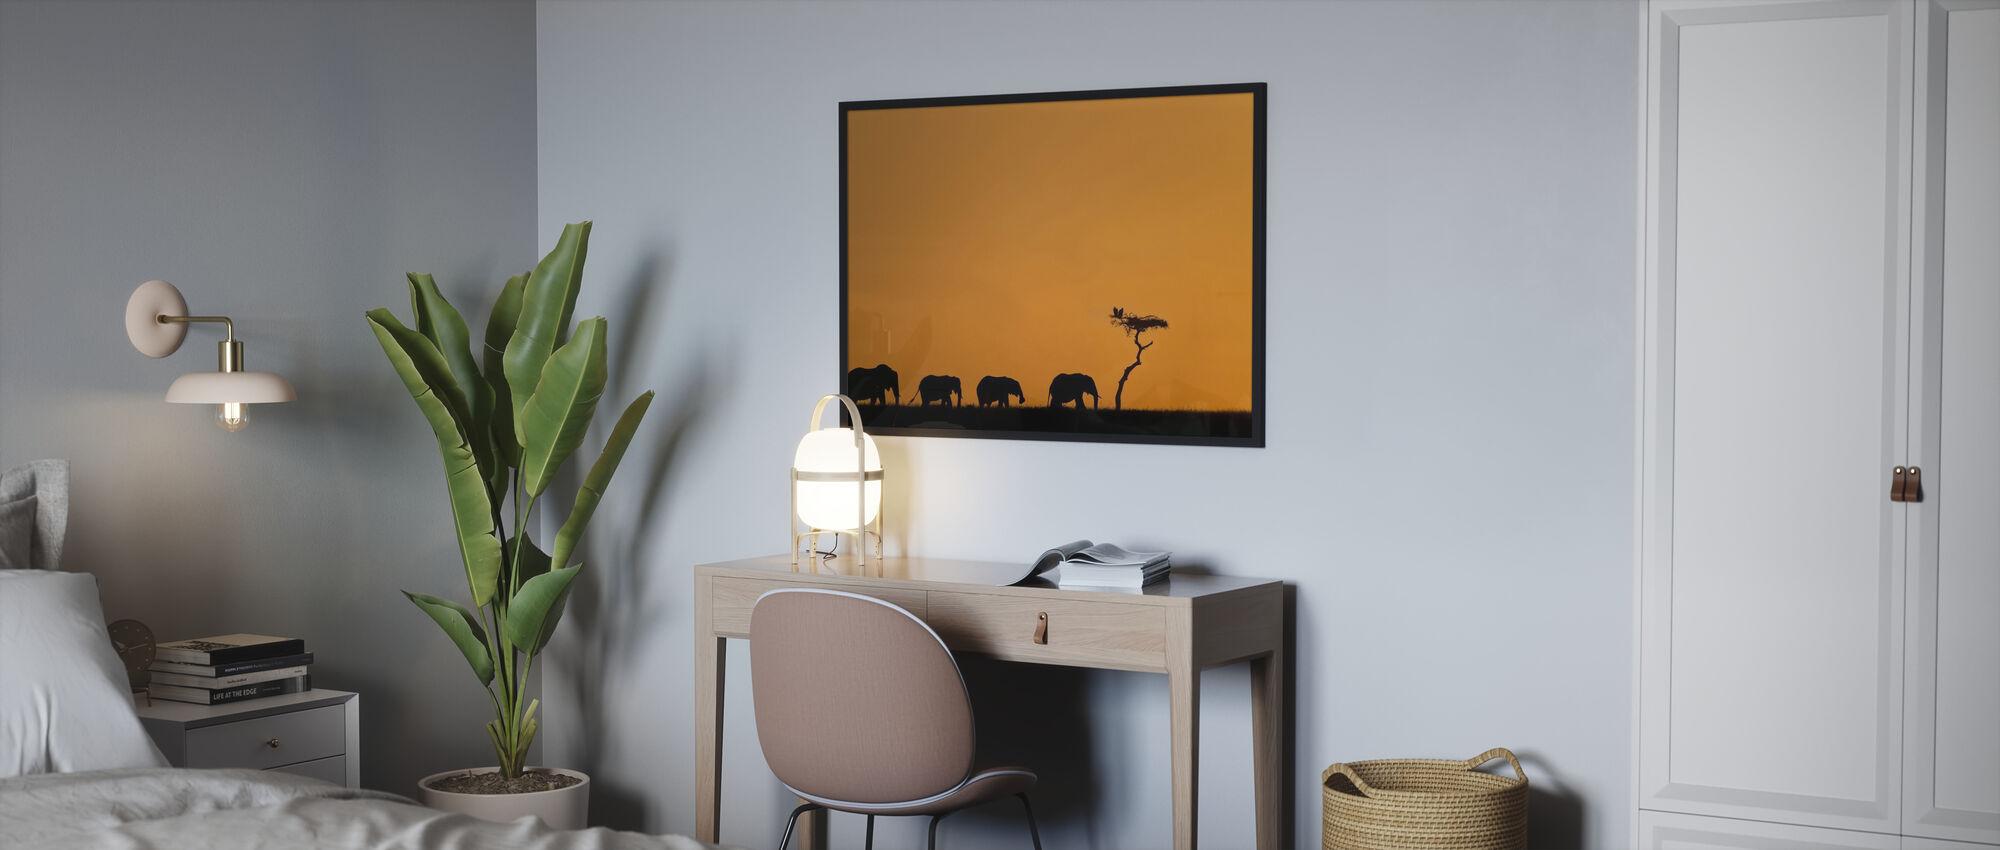 Kudde olifanten en gieren bij zonsopgang - Ingelijste print - Slaapkamer